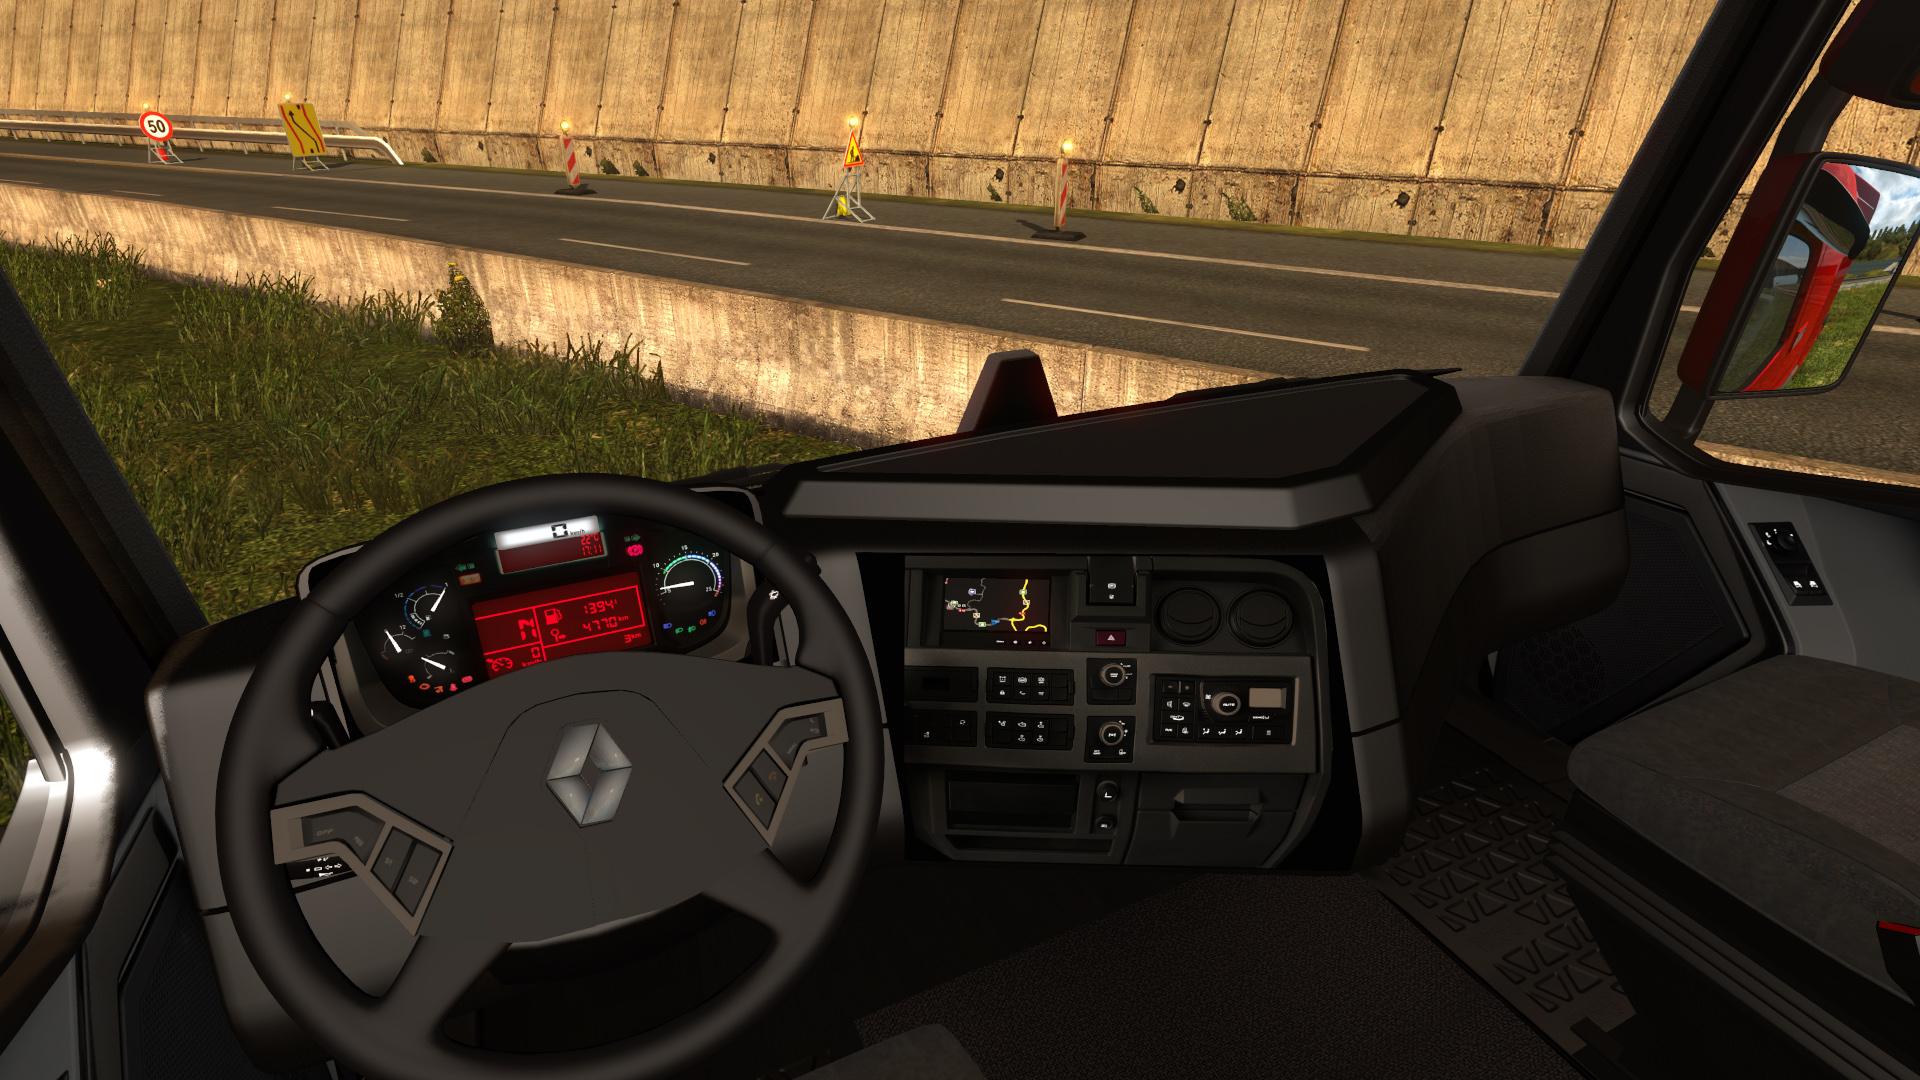 Renault range t fs17 cnc fs15 for Renault range t interieur